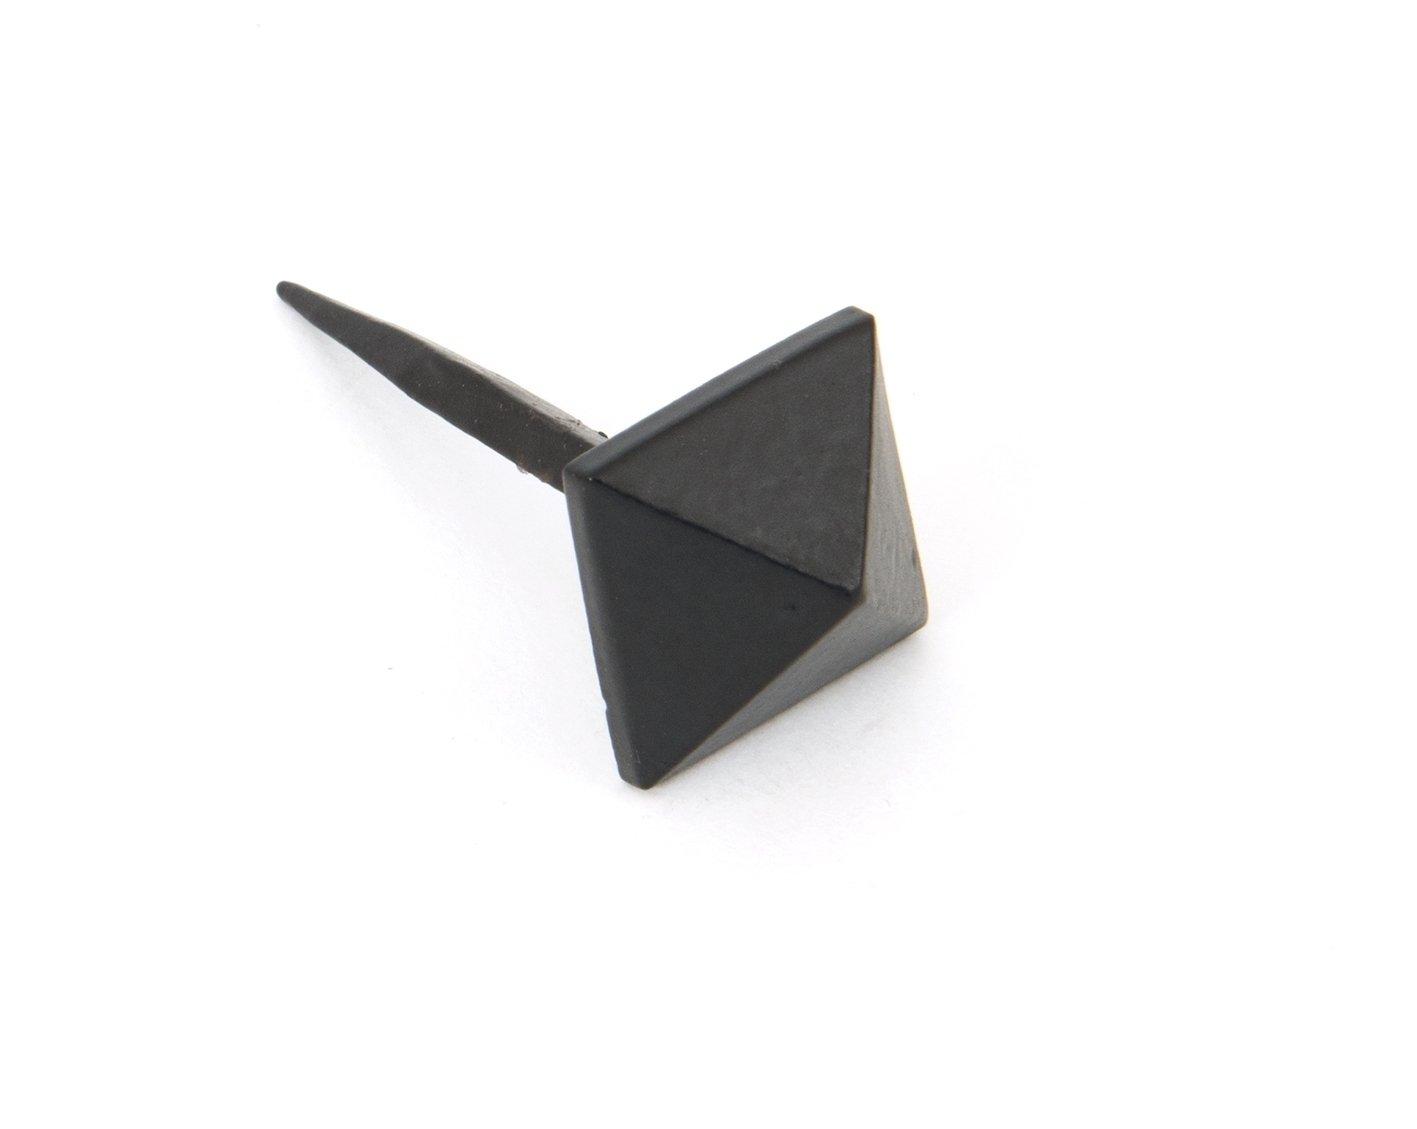 Black Pyramid Door Stud - Small